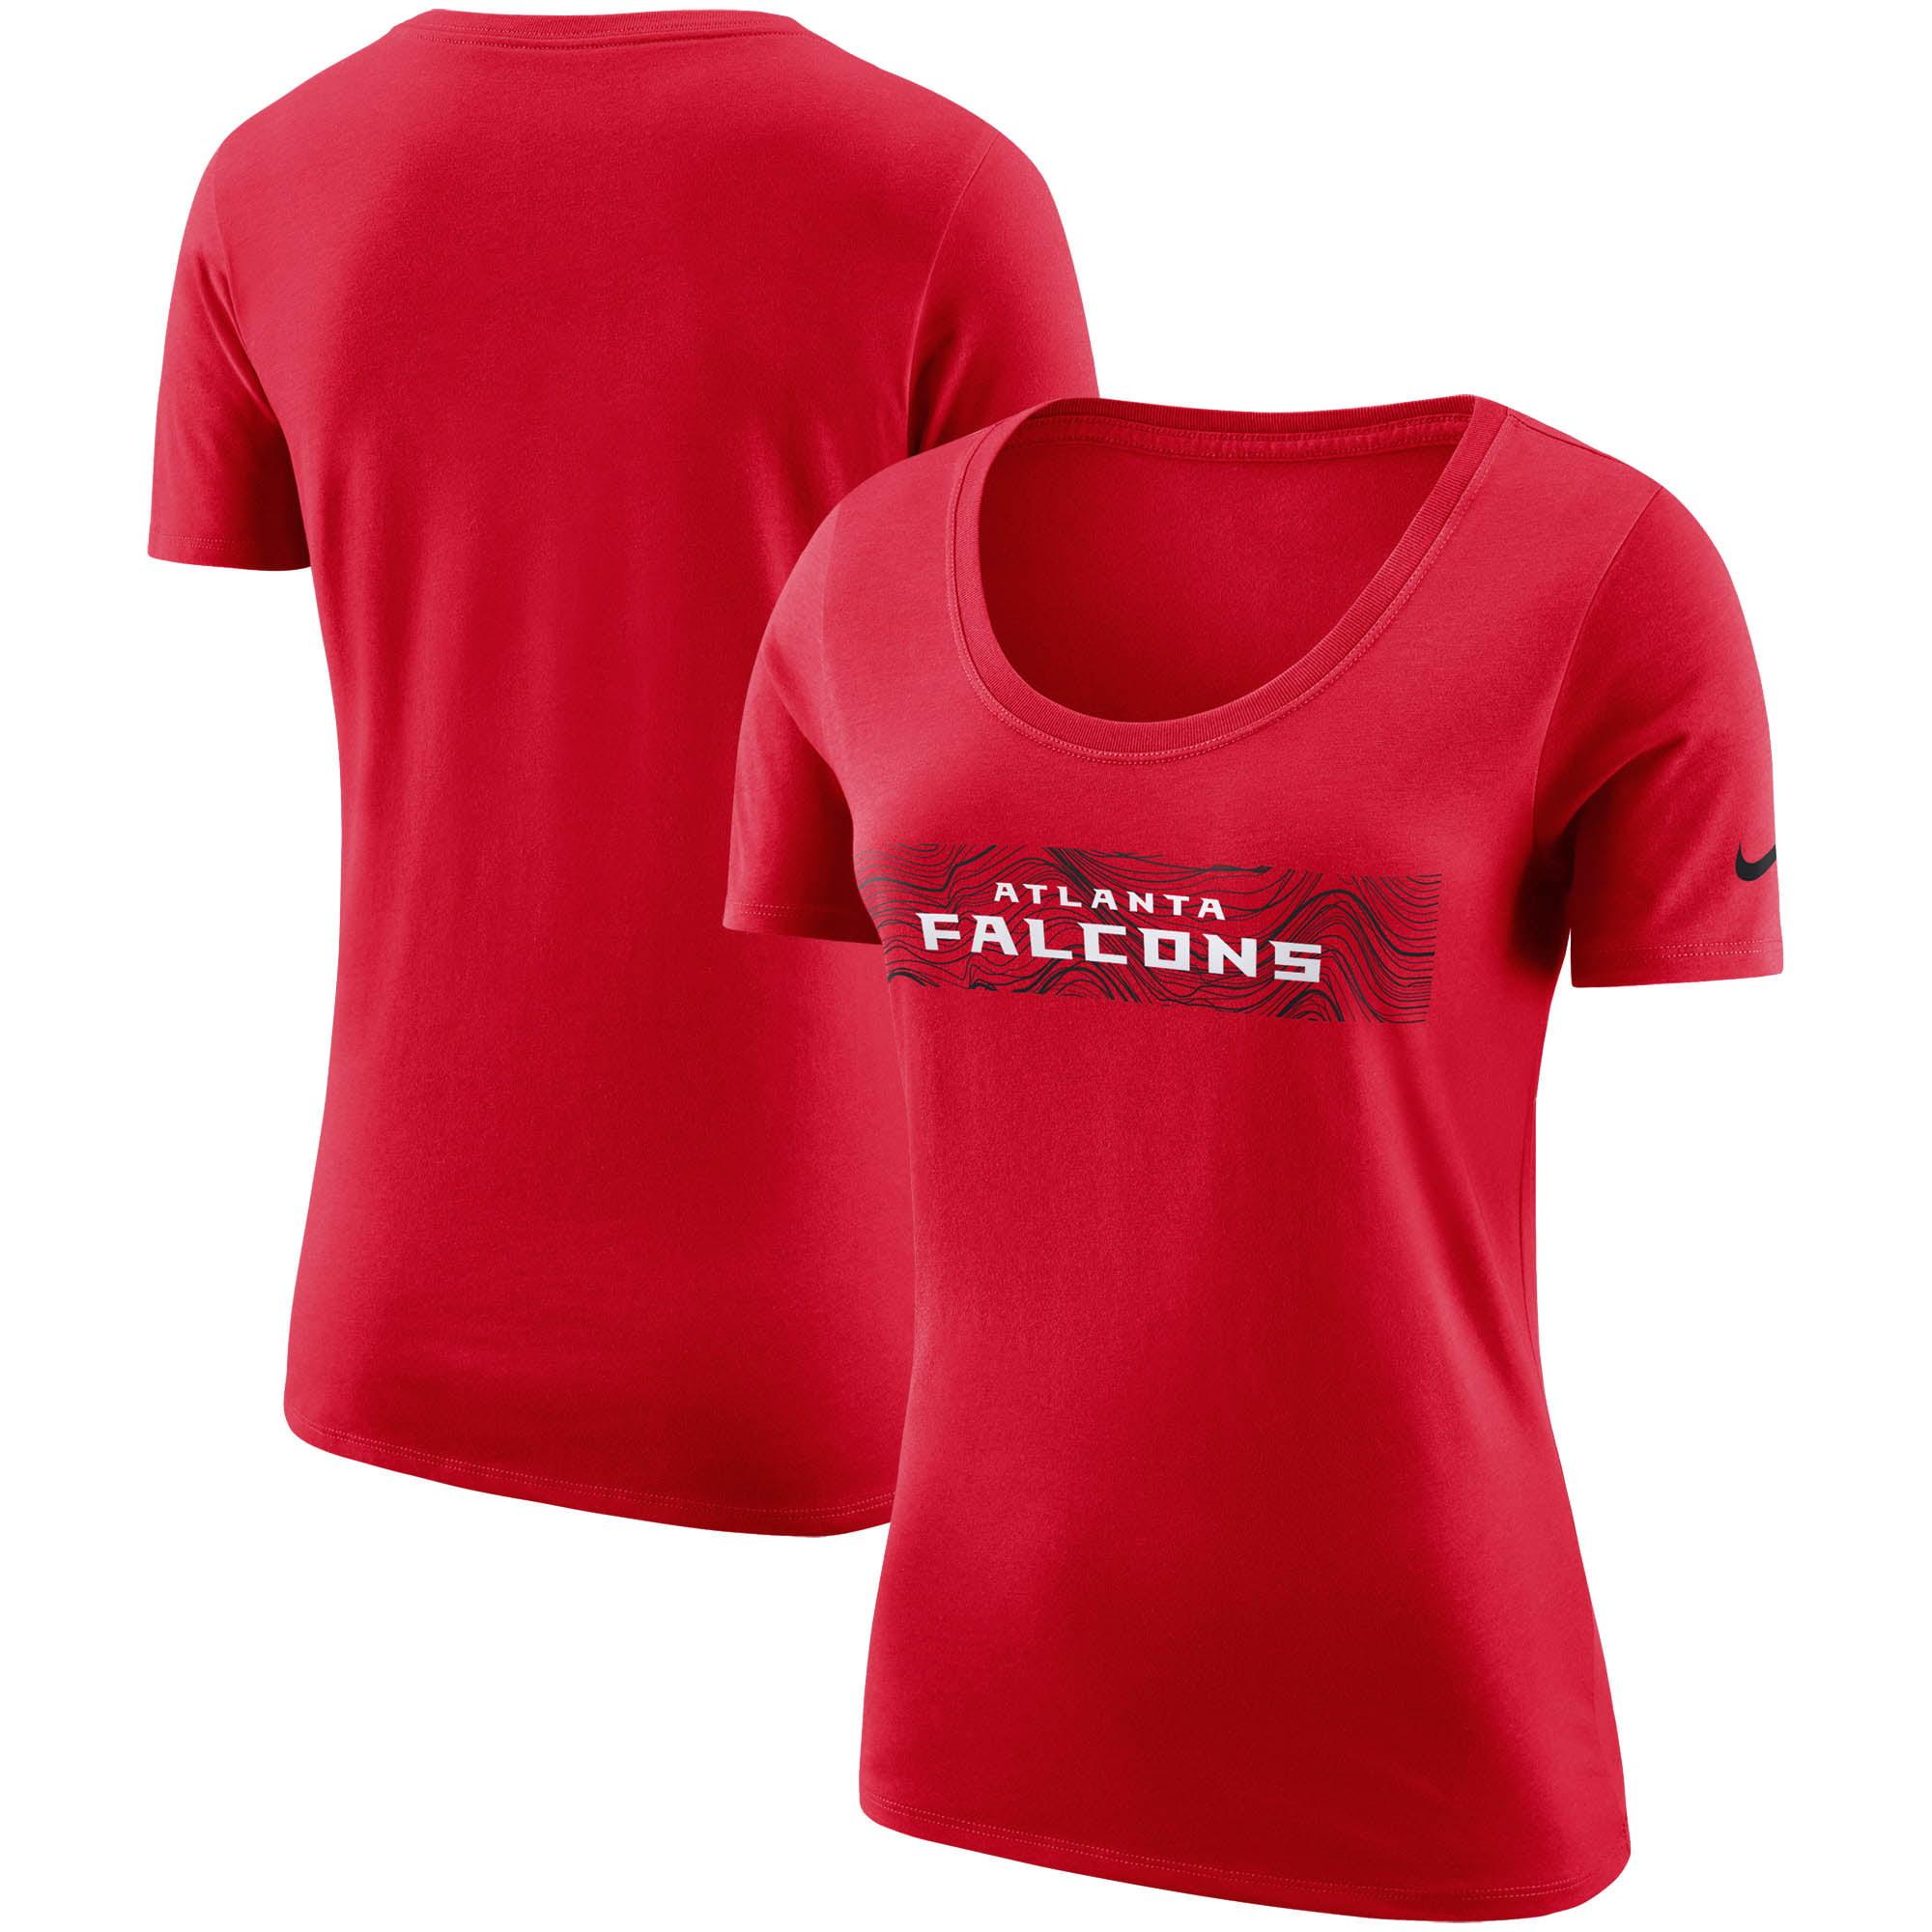 Atlanta Falcons Nike Women's Sideline Team T-Shirt - Red